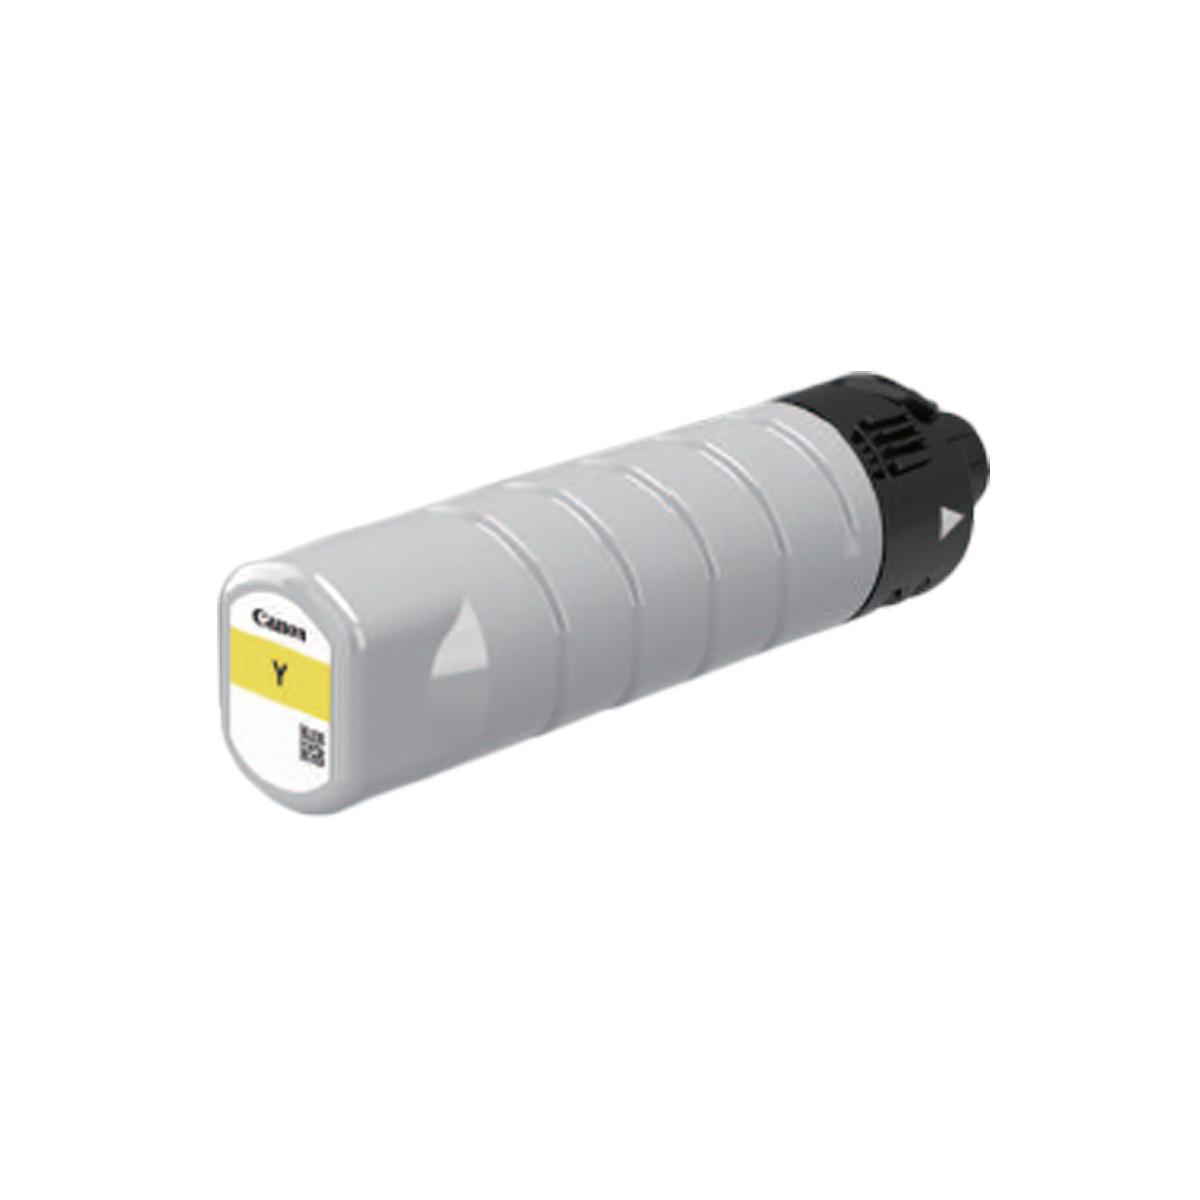 Cartucho de Tinta Canon PGI 7100XXL Amarelo | WG7140 7140 WG-7140 WG 7140 | Original